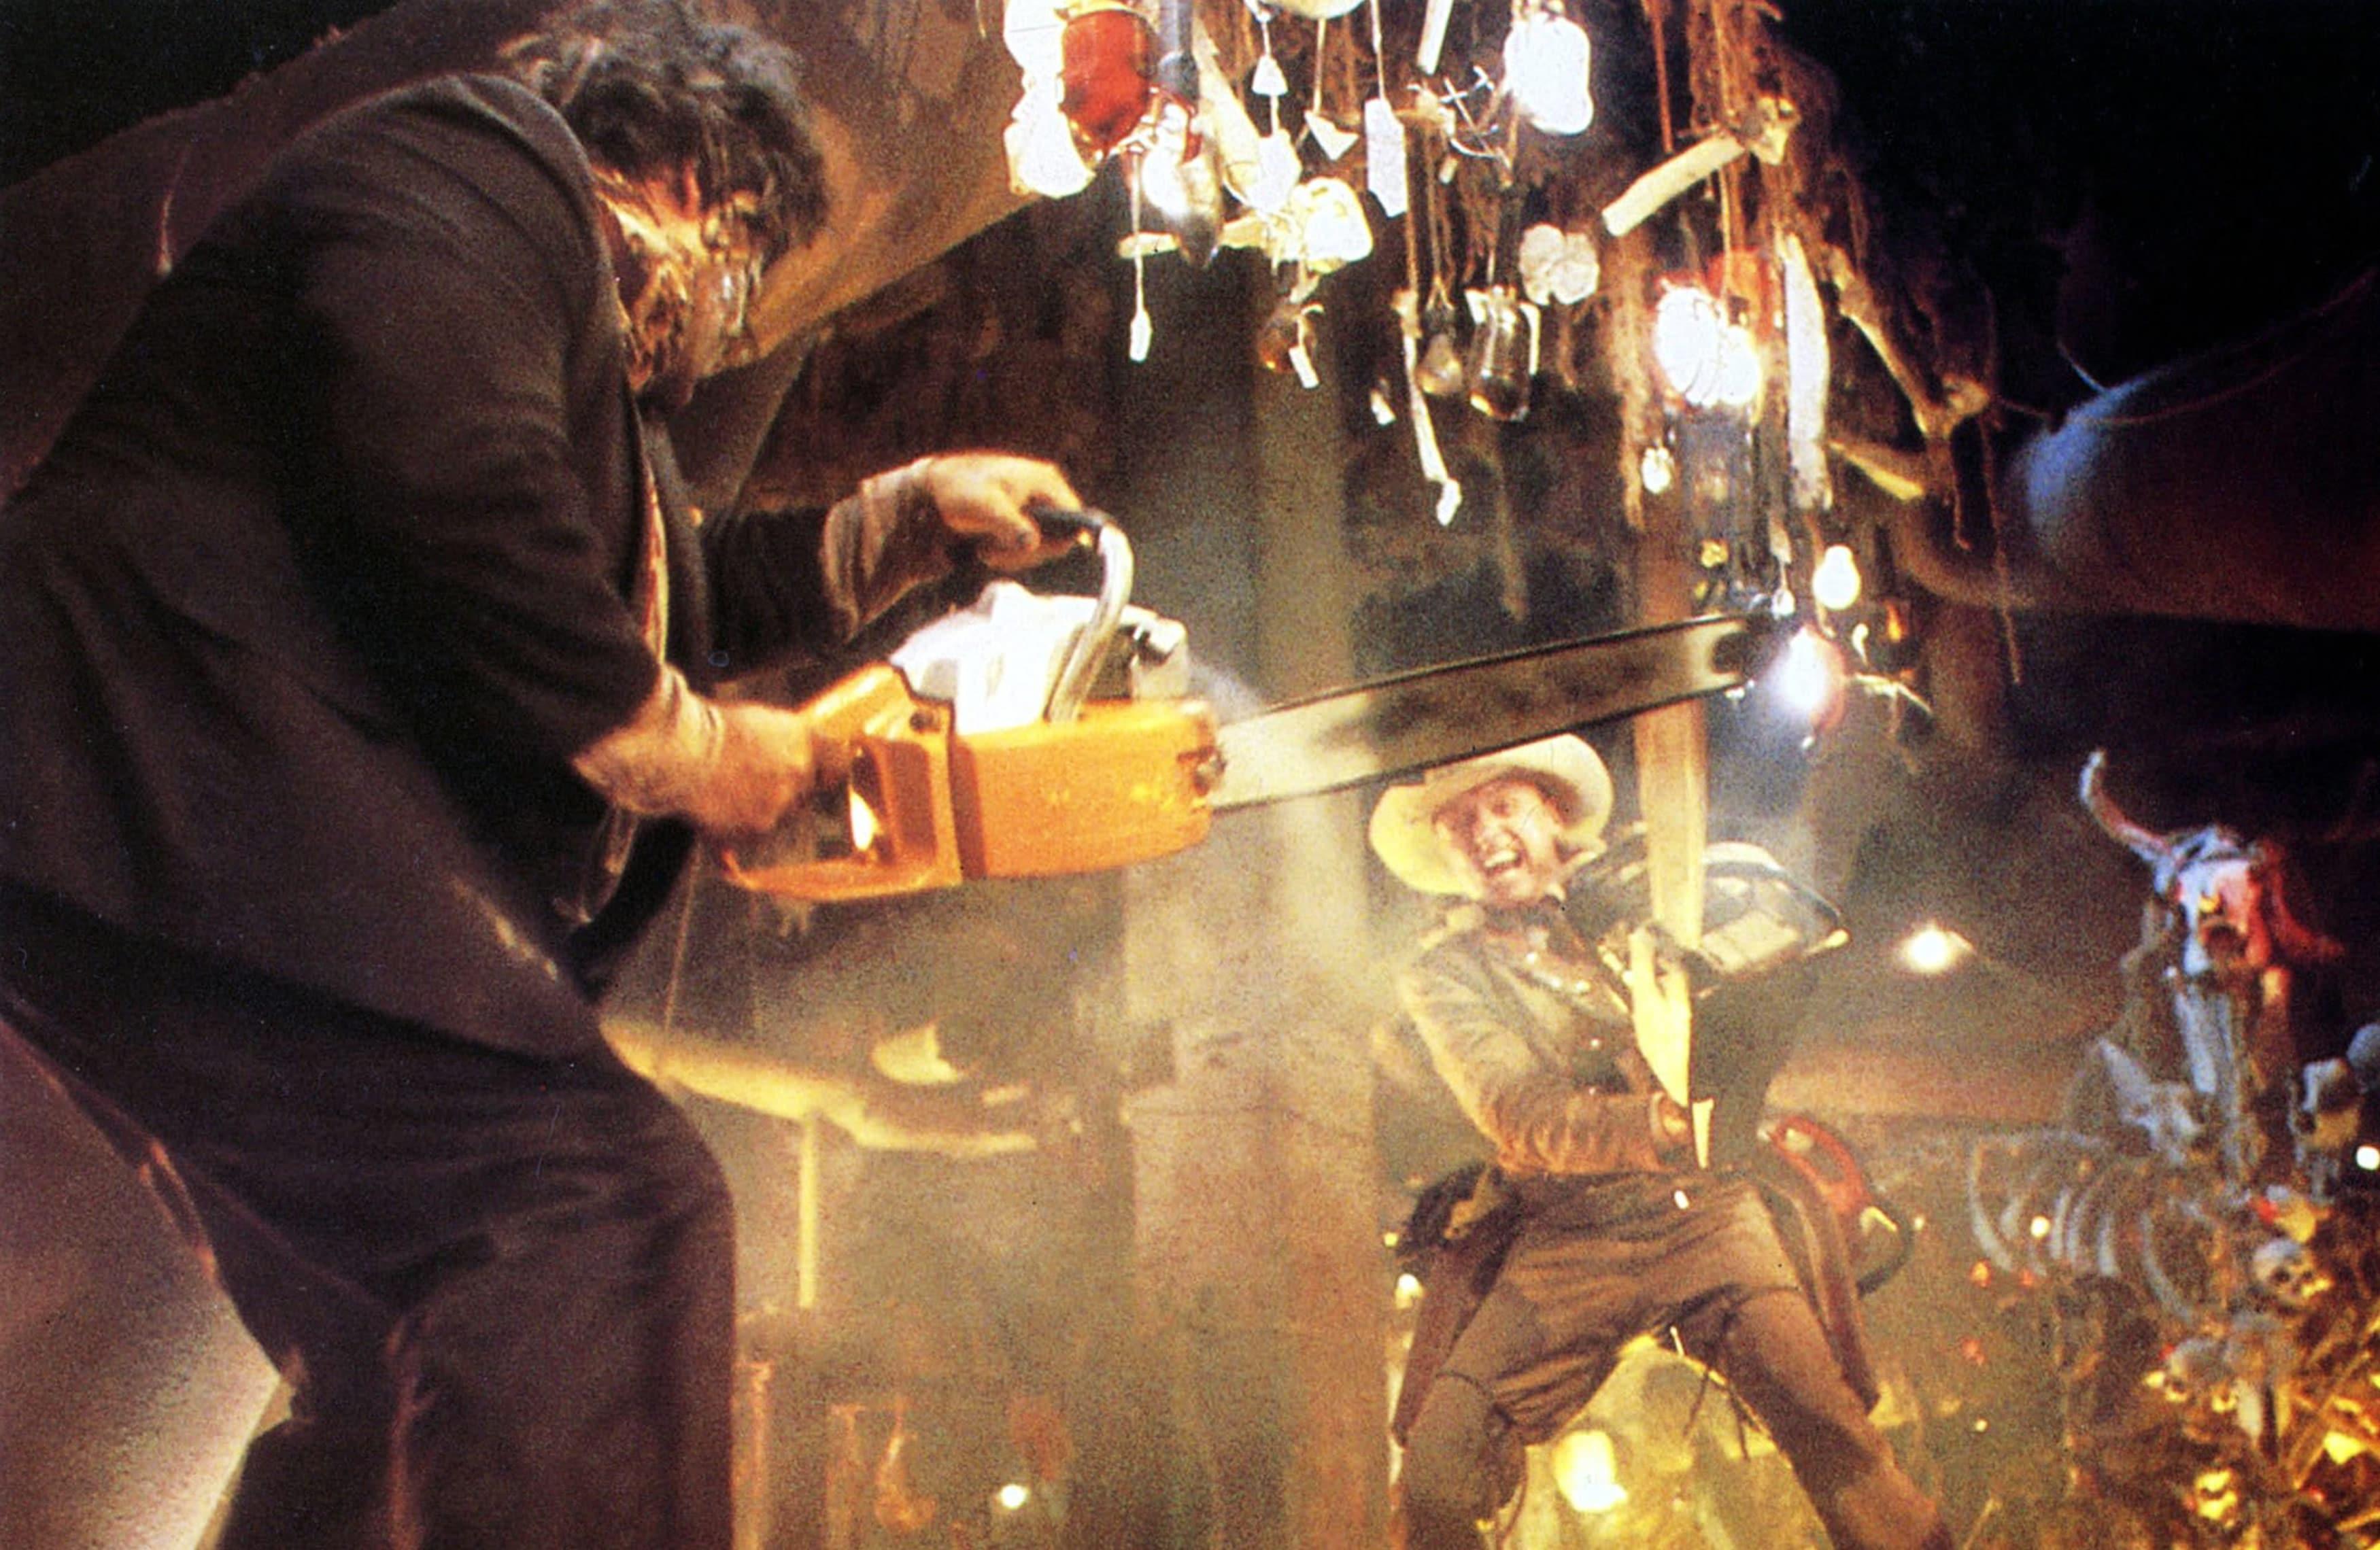 The Texas Chainsaw Massacre 2